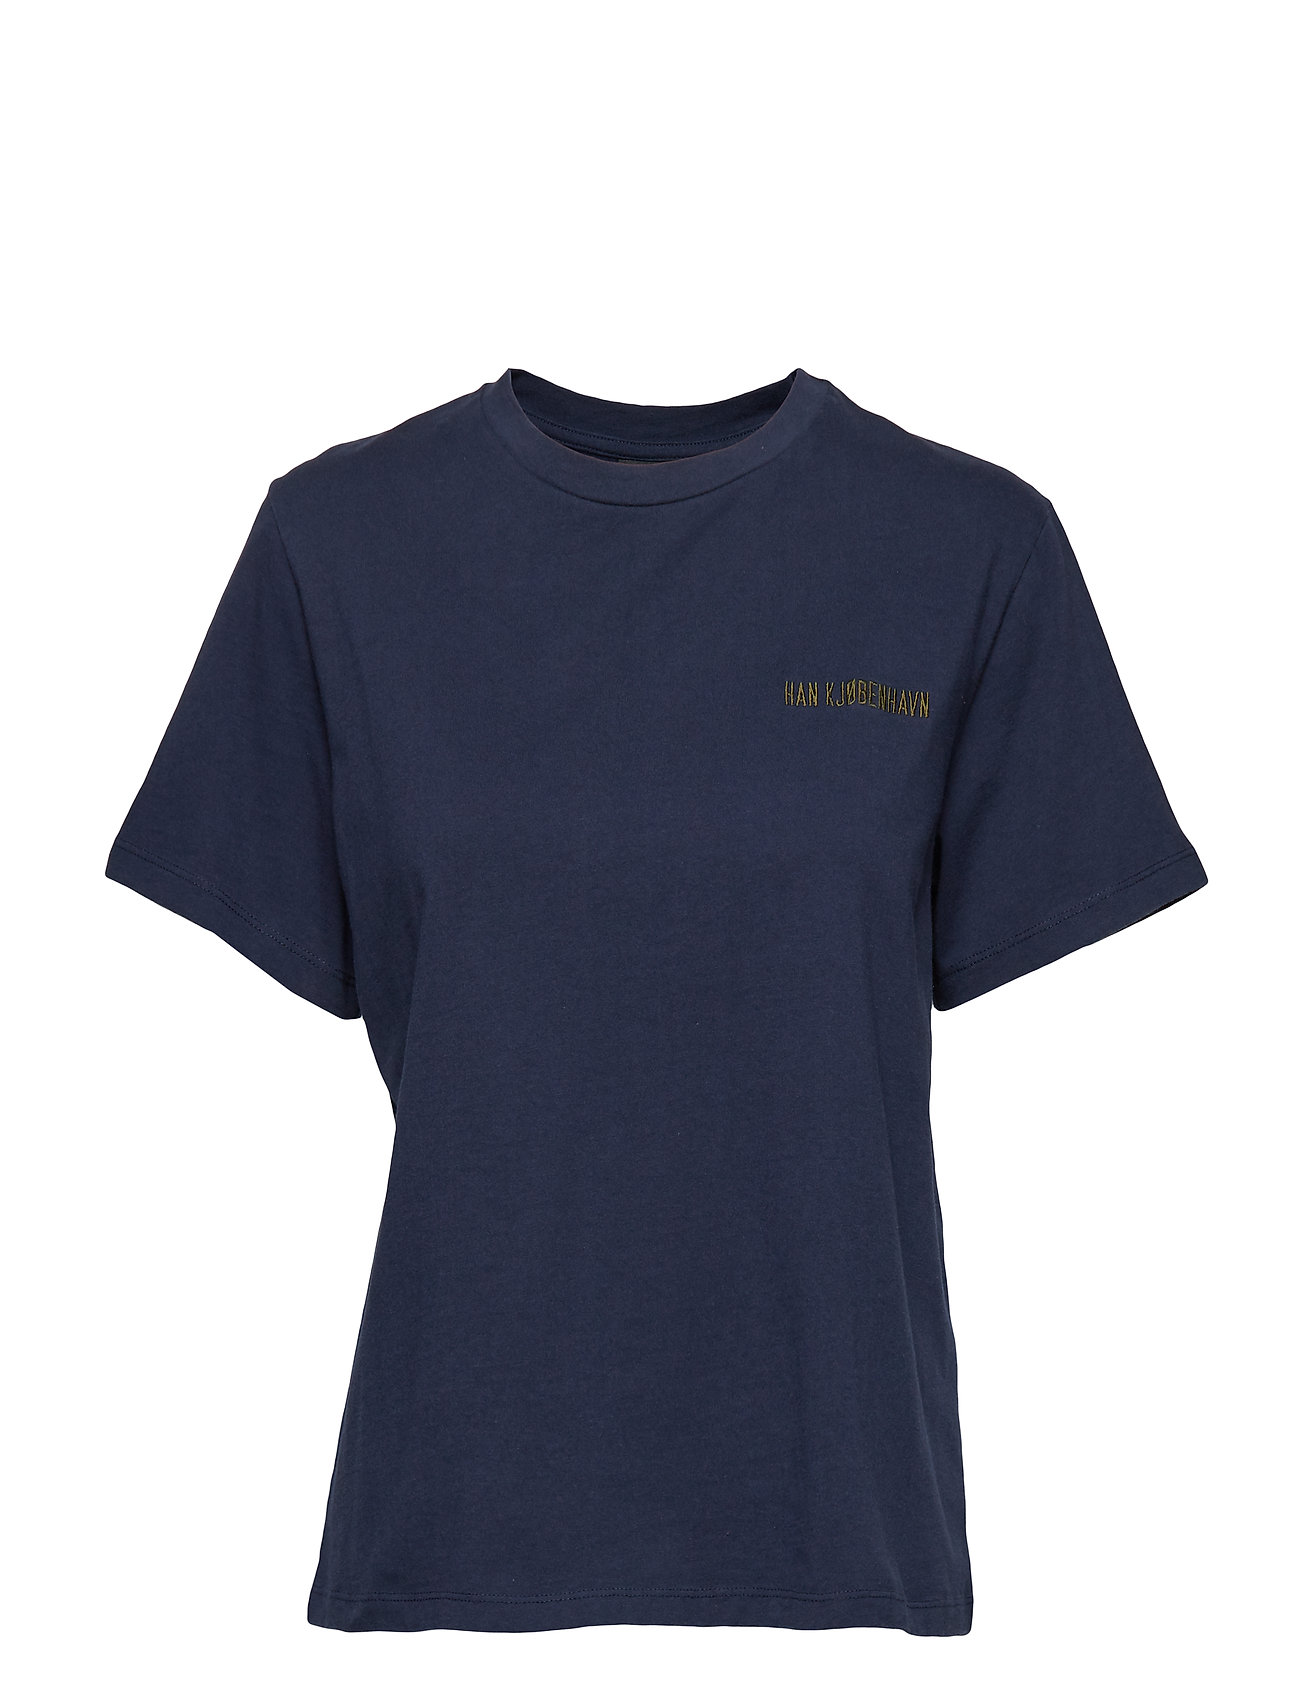 Artwork Tee T shirt Top Blå HAN KJØBENHAVN